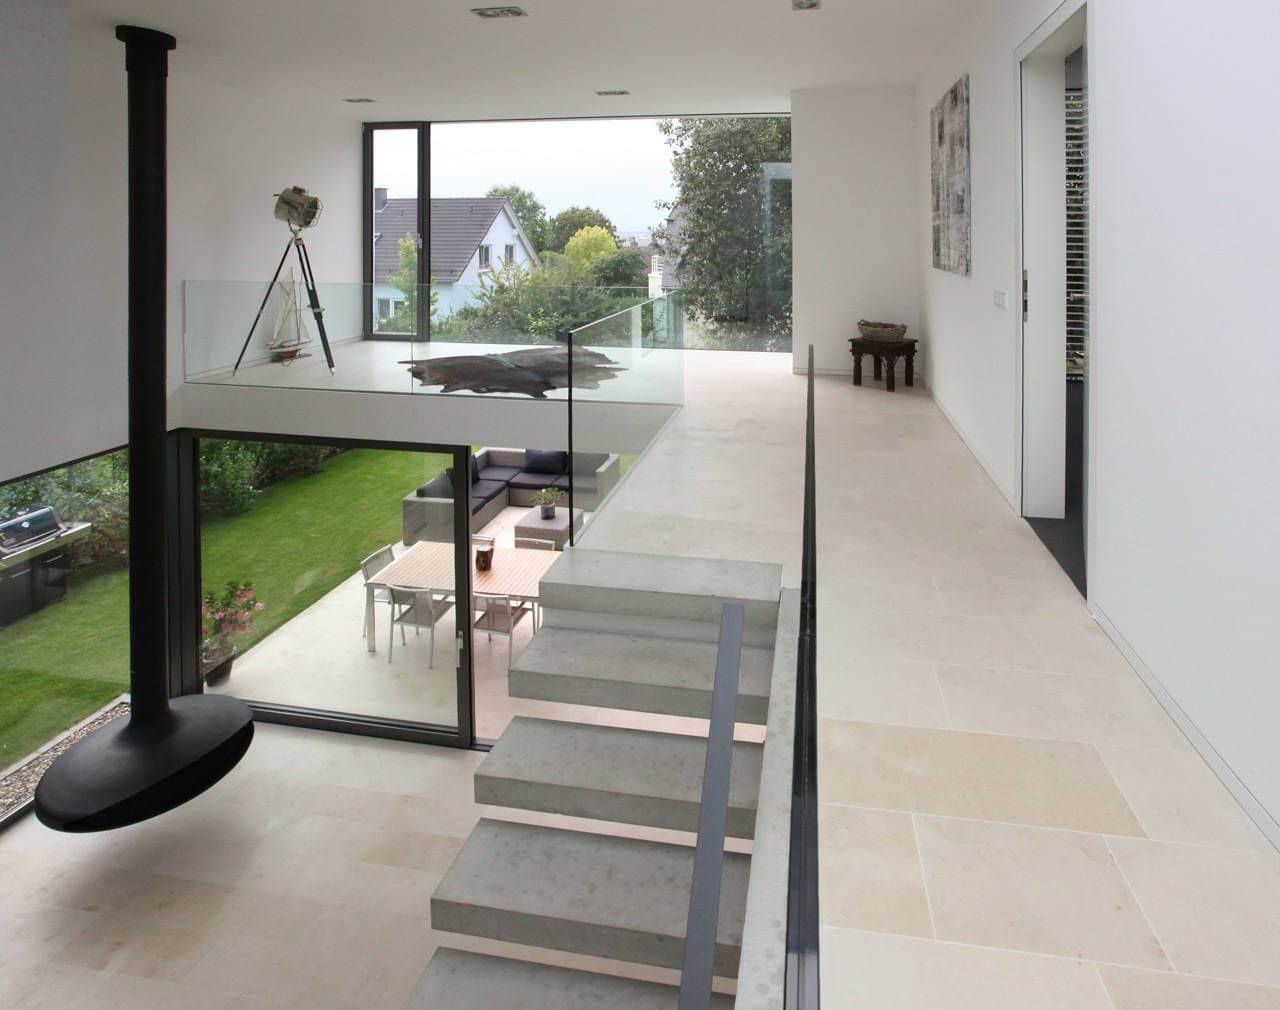 Dise o de casa moderna de dos pisos for Ambientes casas modernas